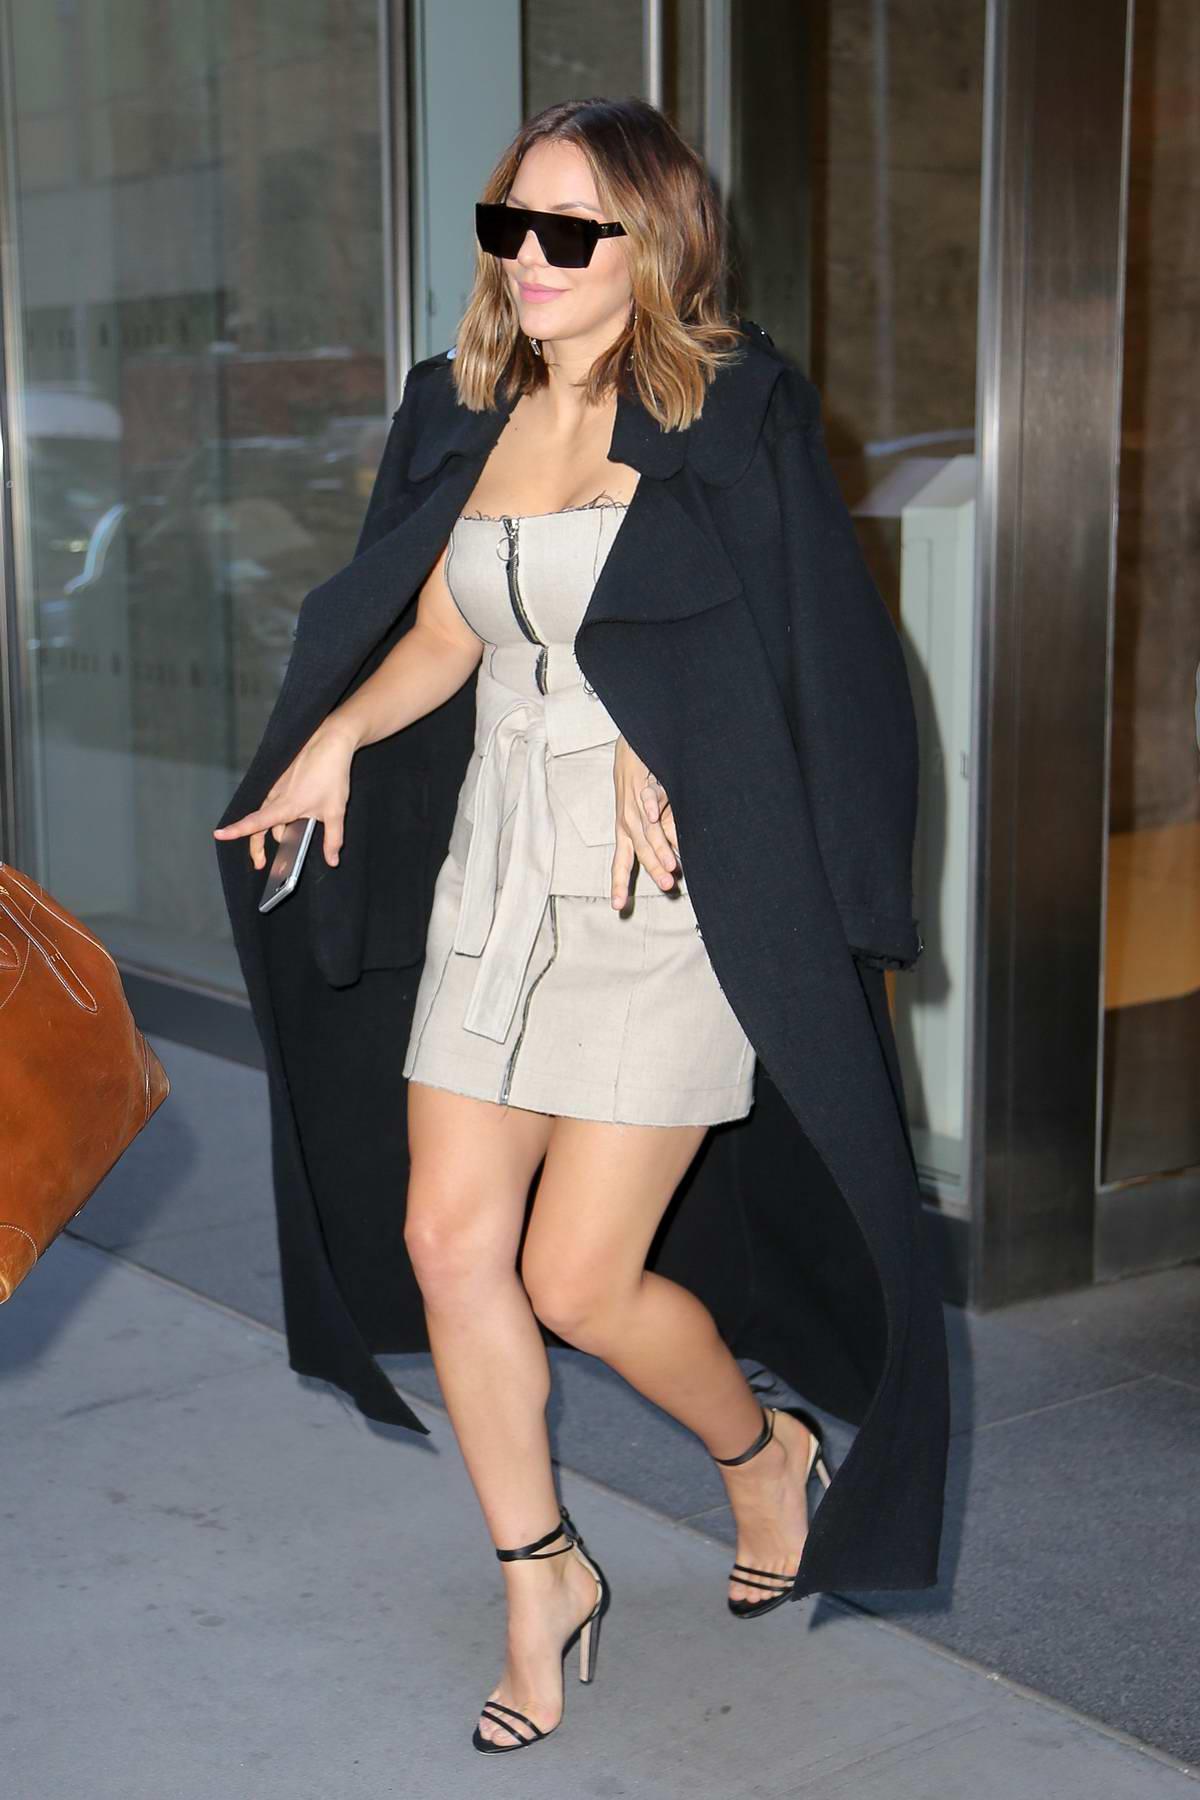 Katharine McPhee spotted leaving the SiriusXM studios in New York City